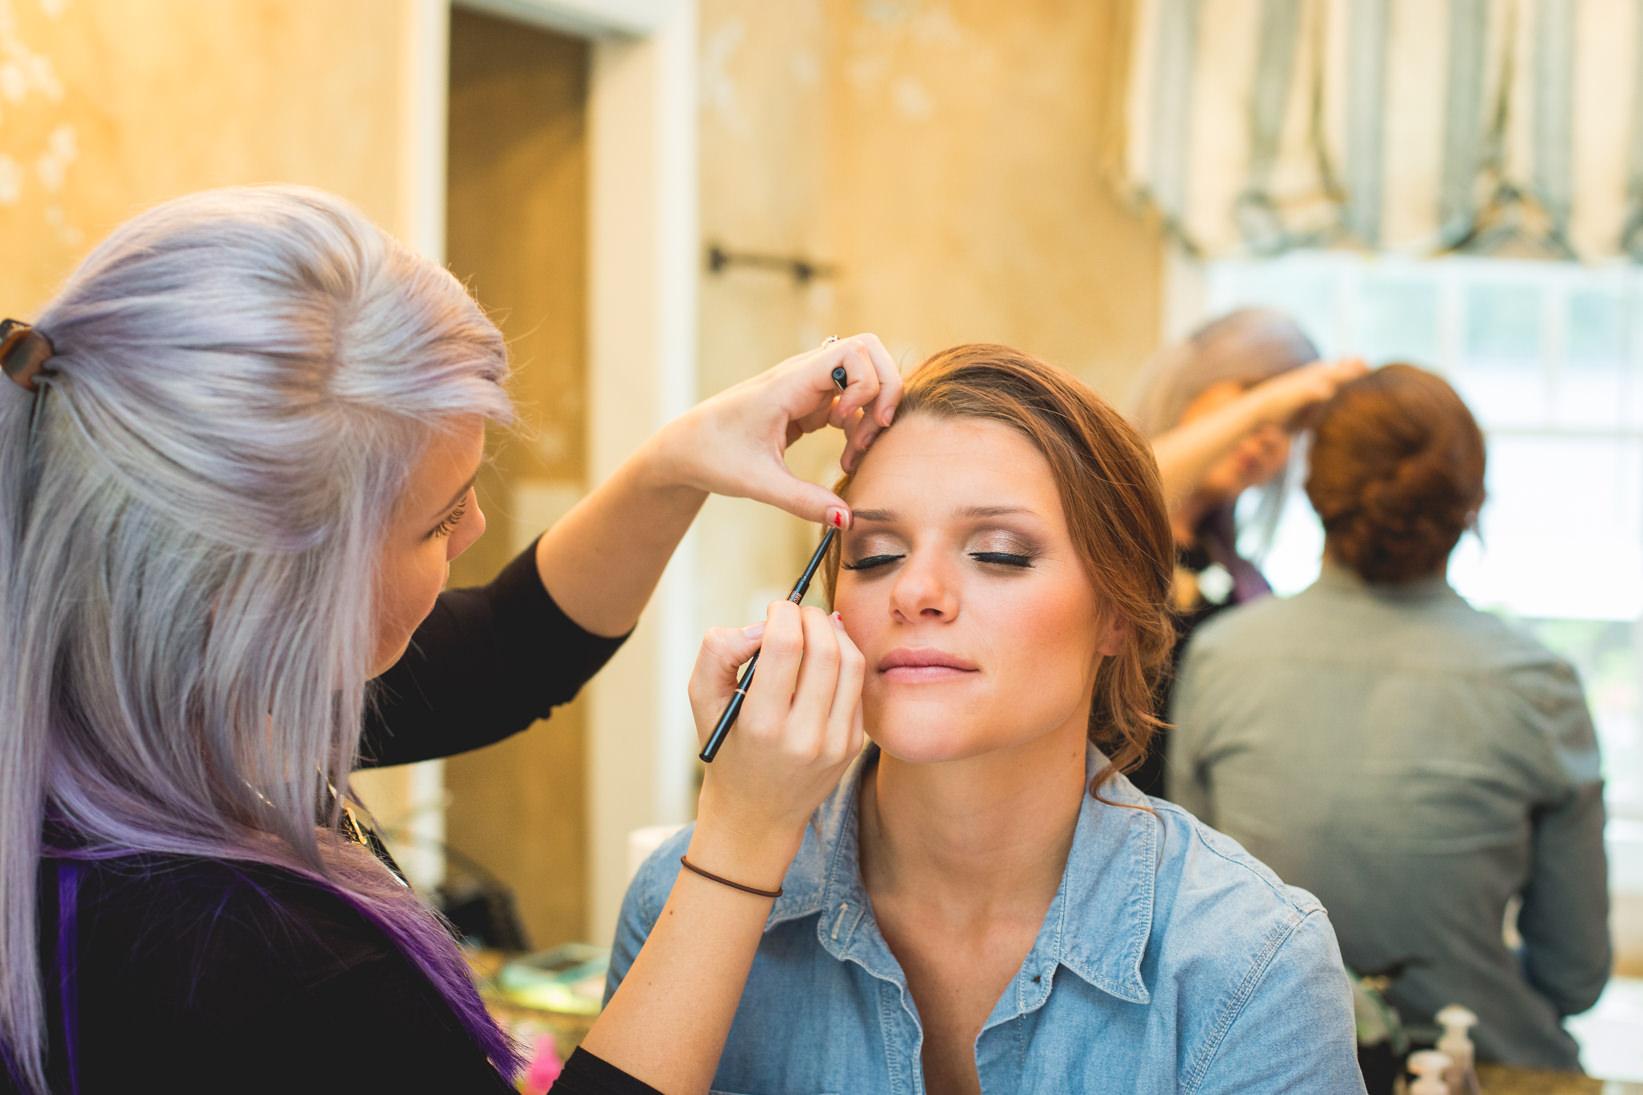 erin-kelly-makeup-artist.jpg